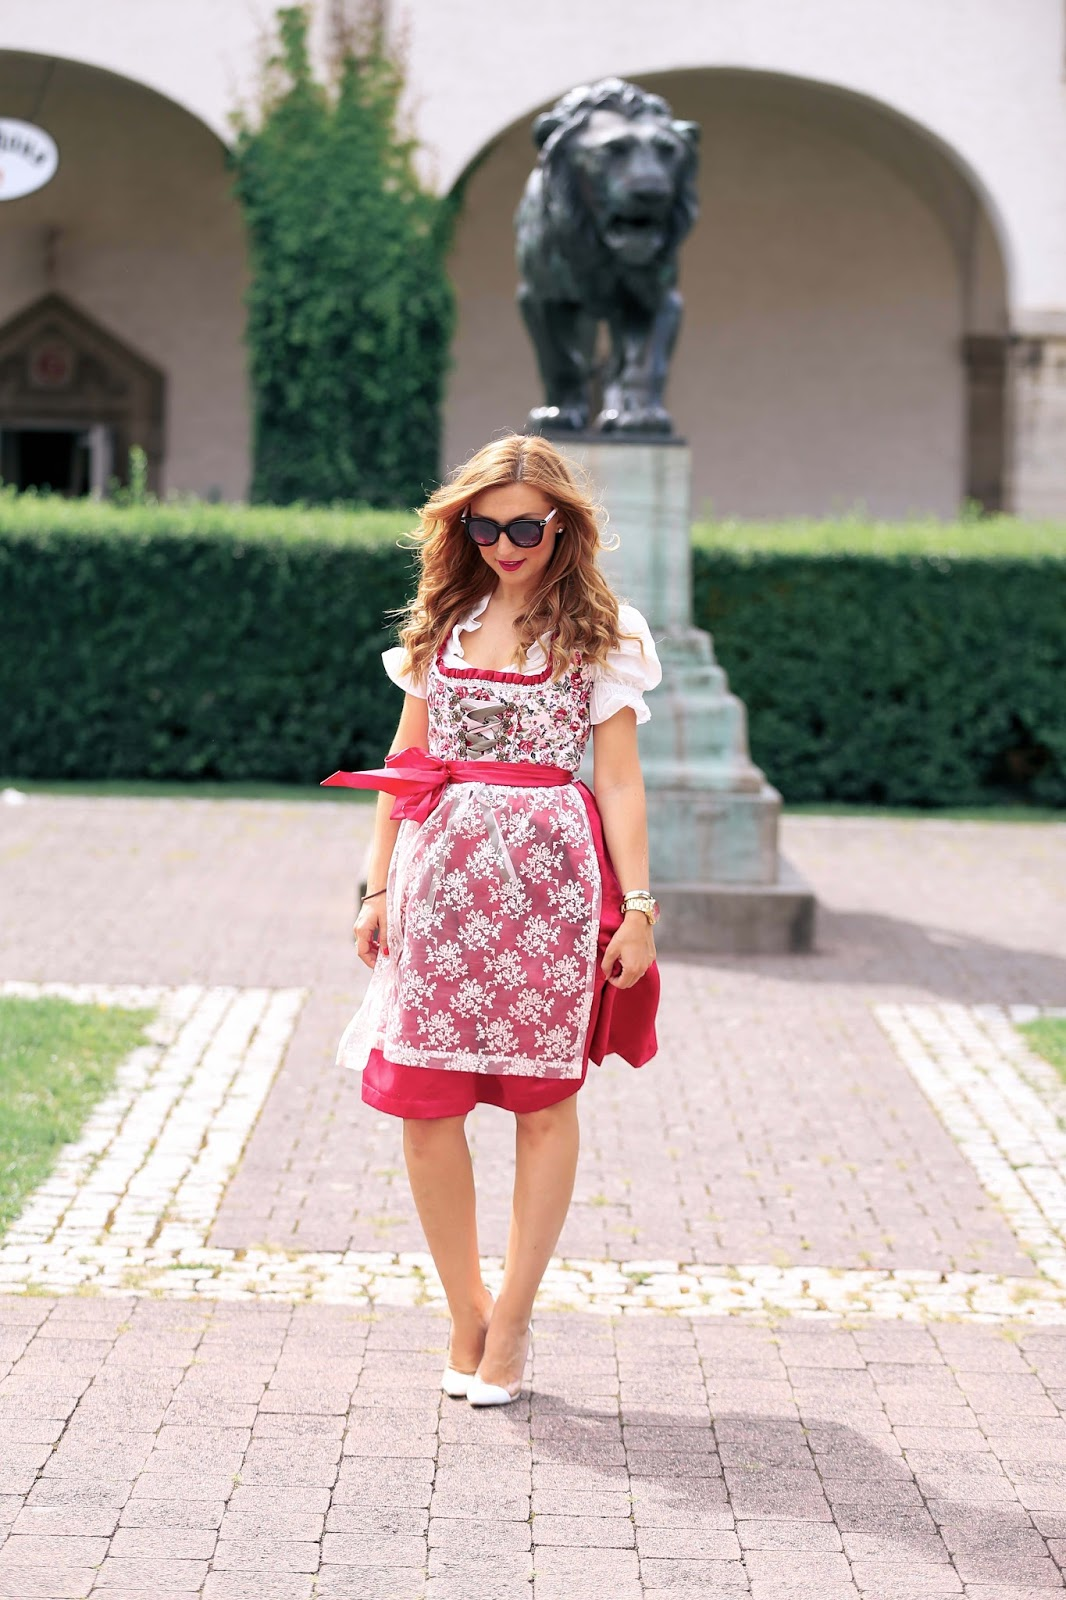 fashionstylebyjohanna-fashionblog-frankfurt-styleblog-frankfurt-blogger-deutschland-fashionblogger-bloggerdeutschland-lifestyleblog-modeblog-germanblogger-dirndl-inspiration